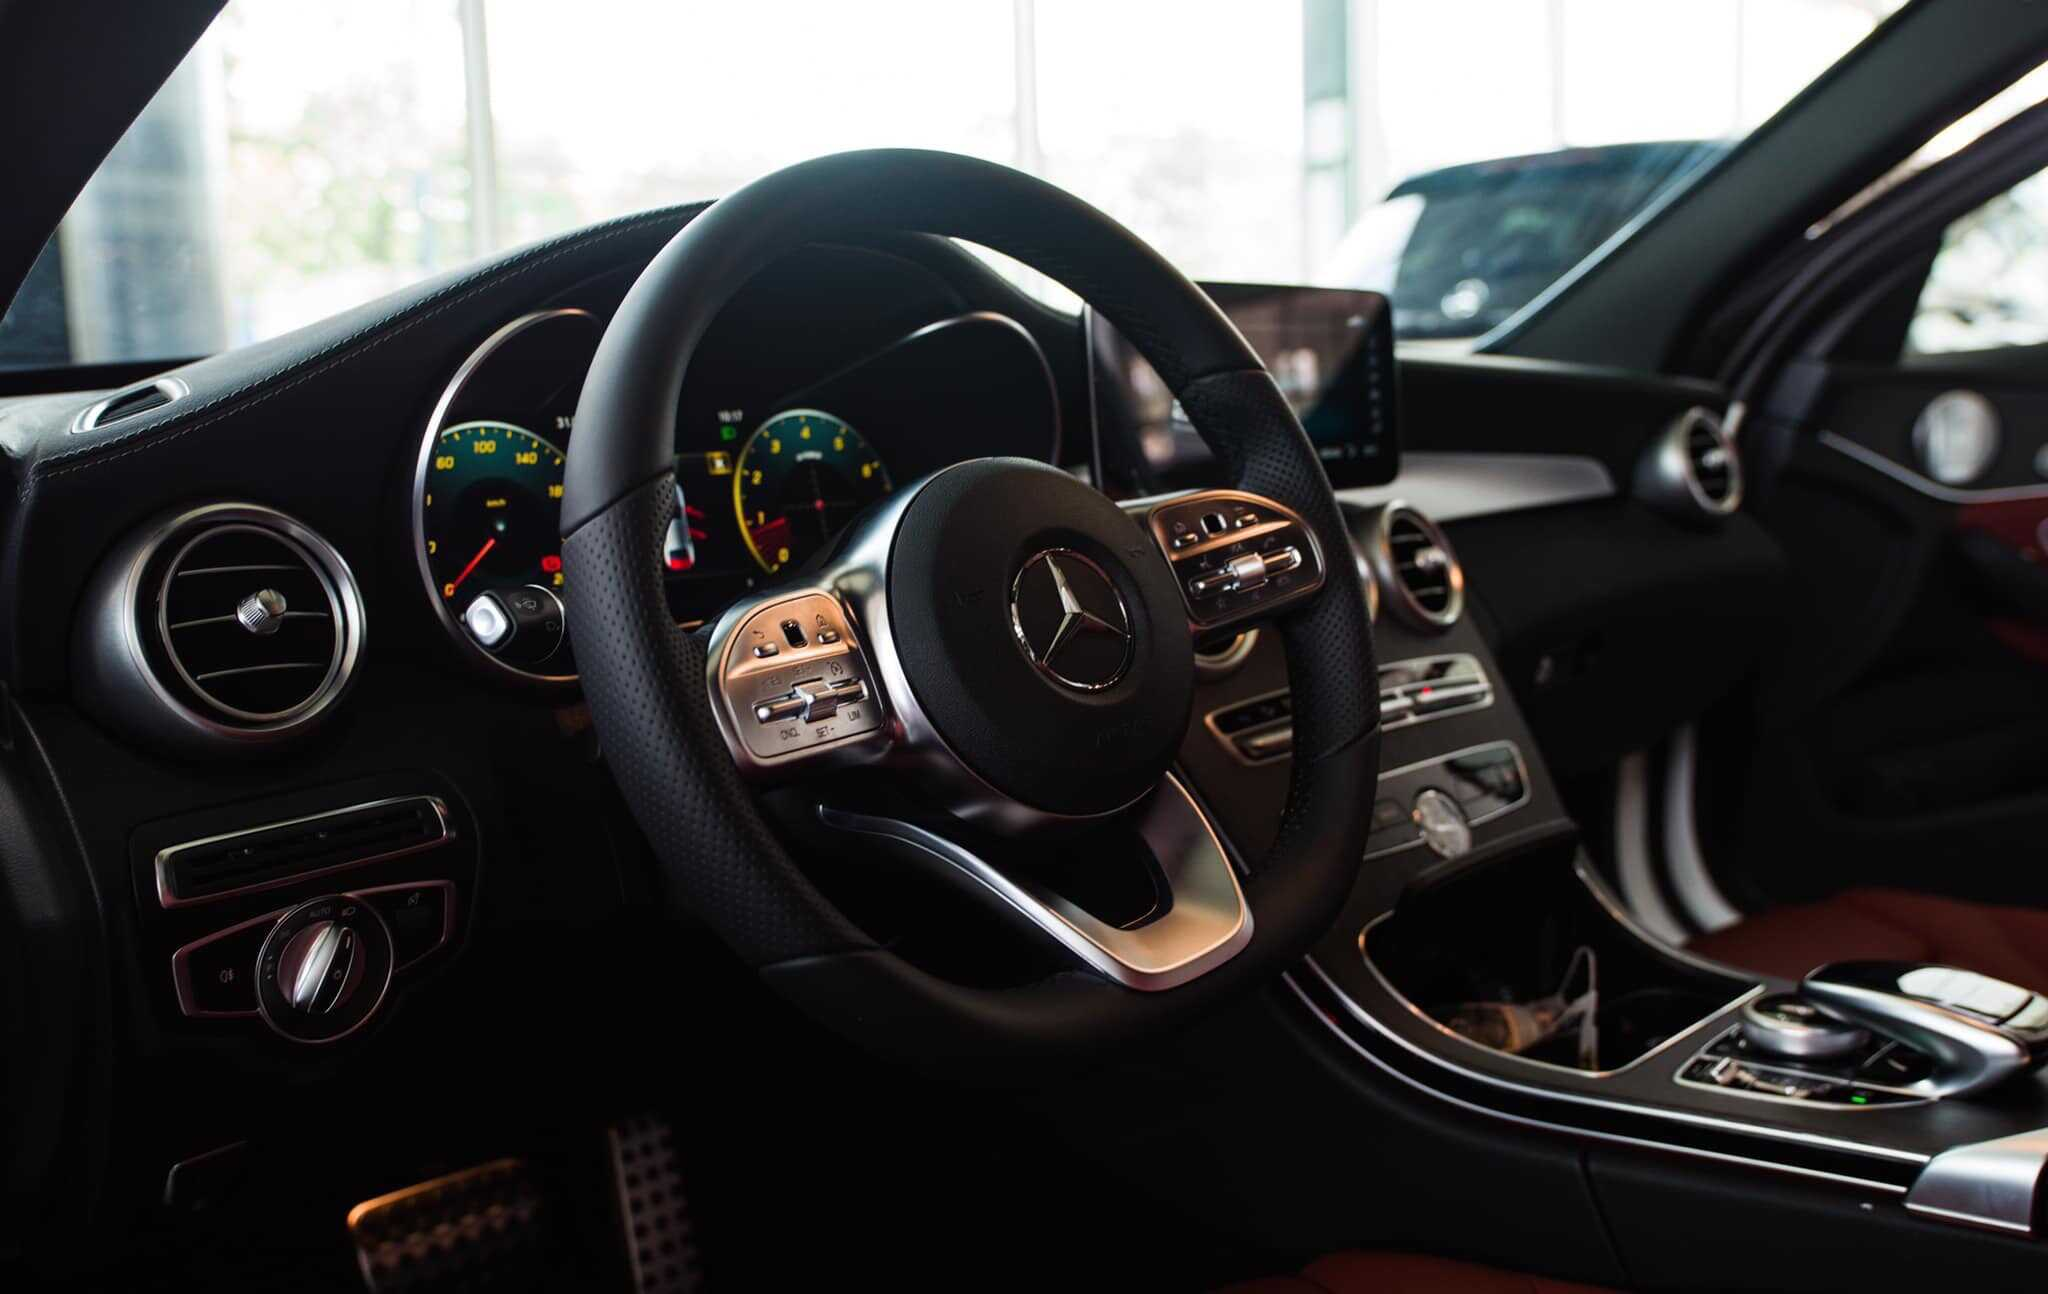 Mercedes C300 AMG 2022 Mercedes Vietnam (15)